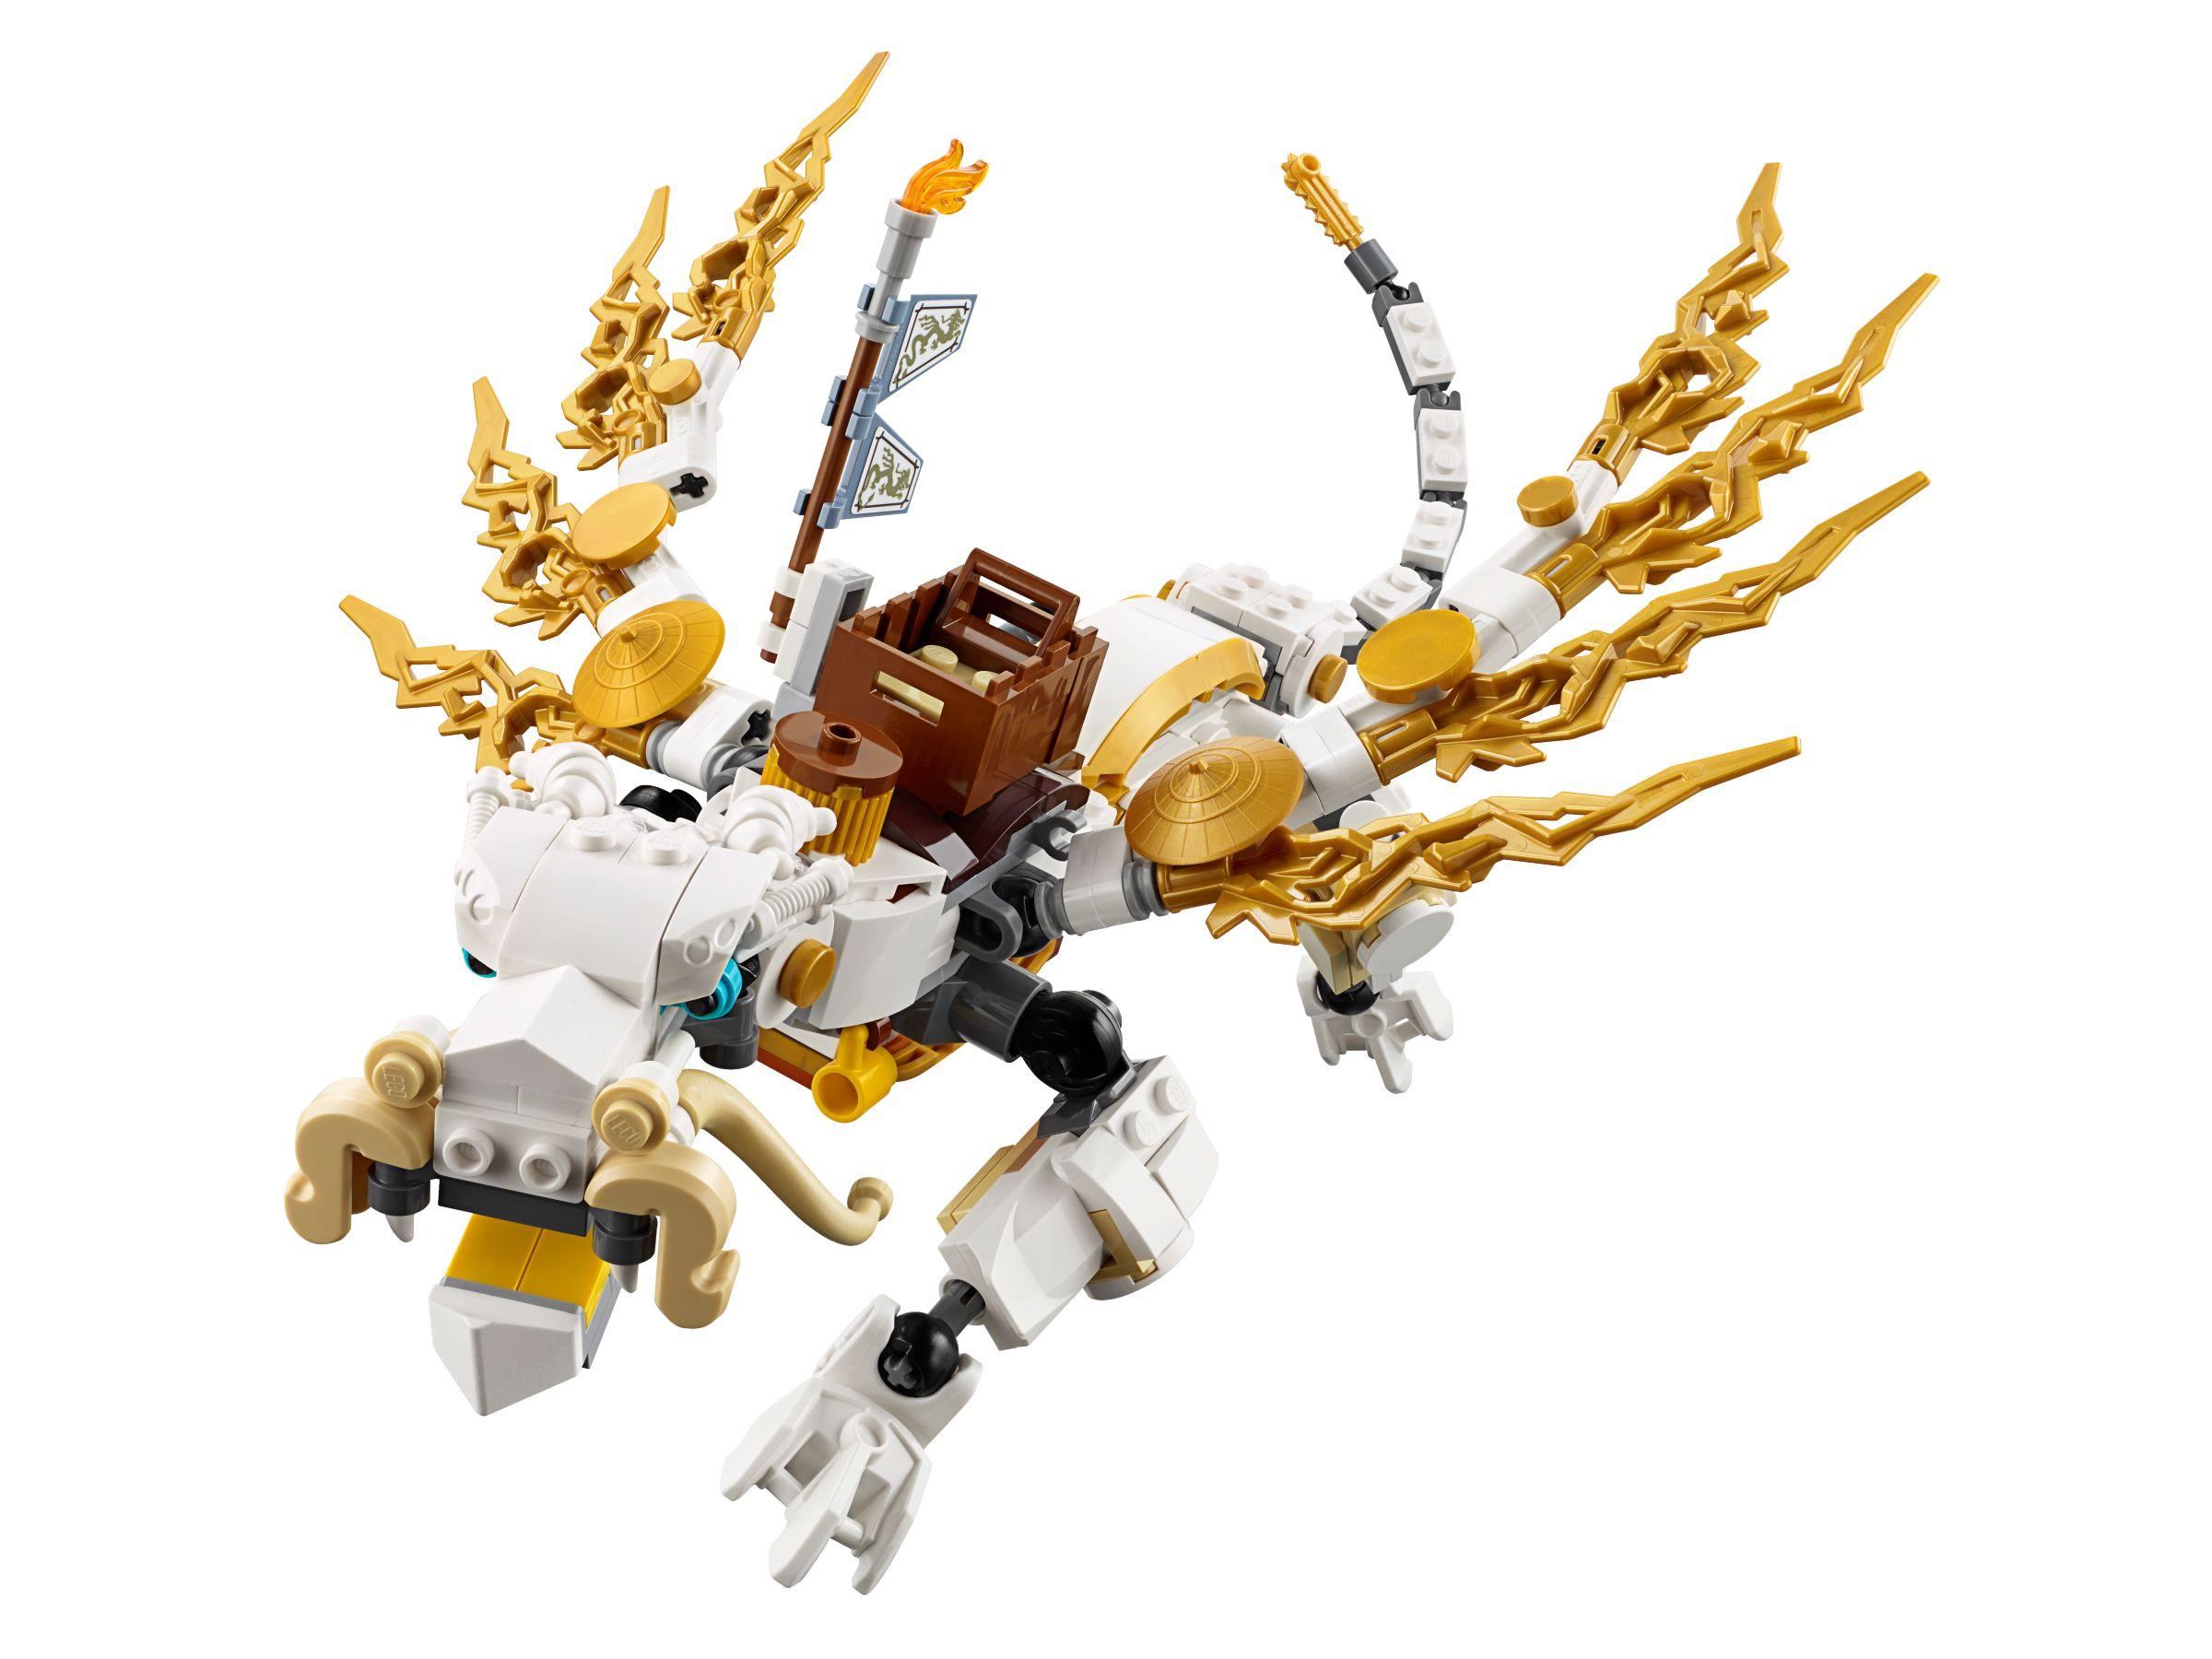 Lego 70734 meister wu 39 s drache ninjago 2015 master wu dragon brickmerge - Dragon ninjago lego ...